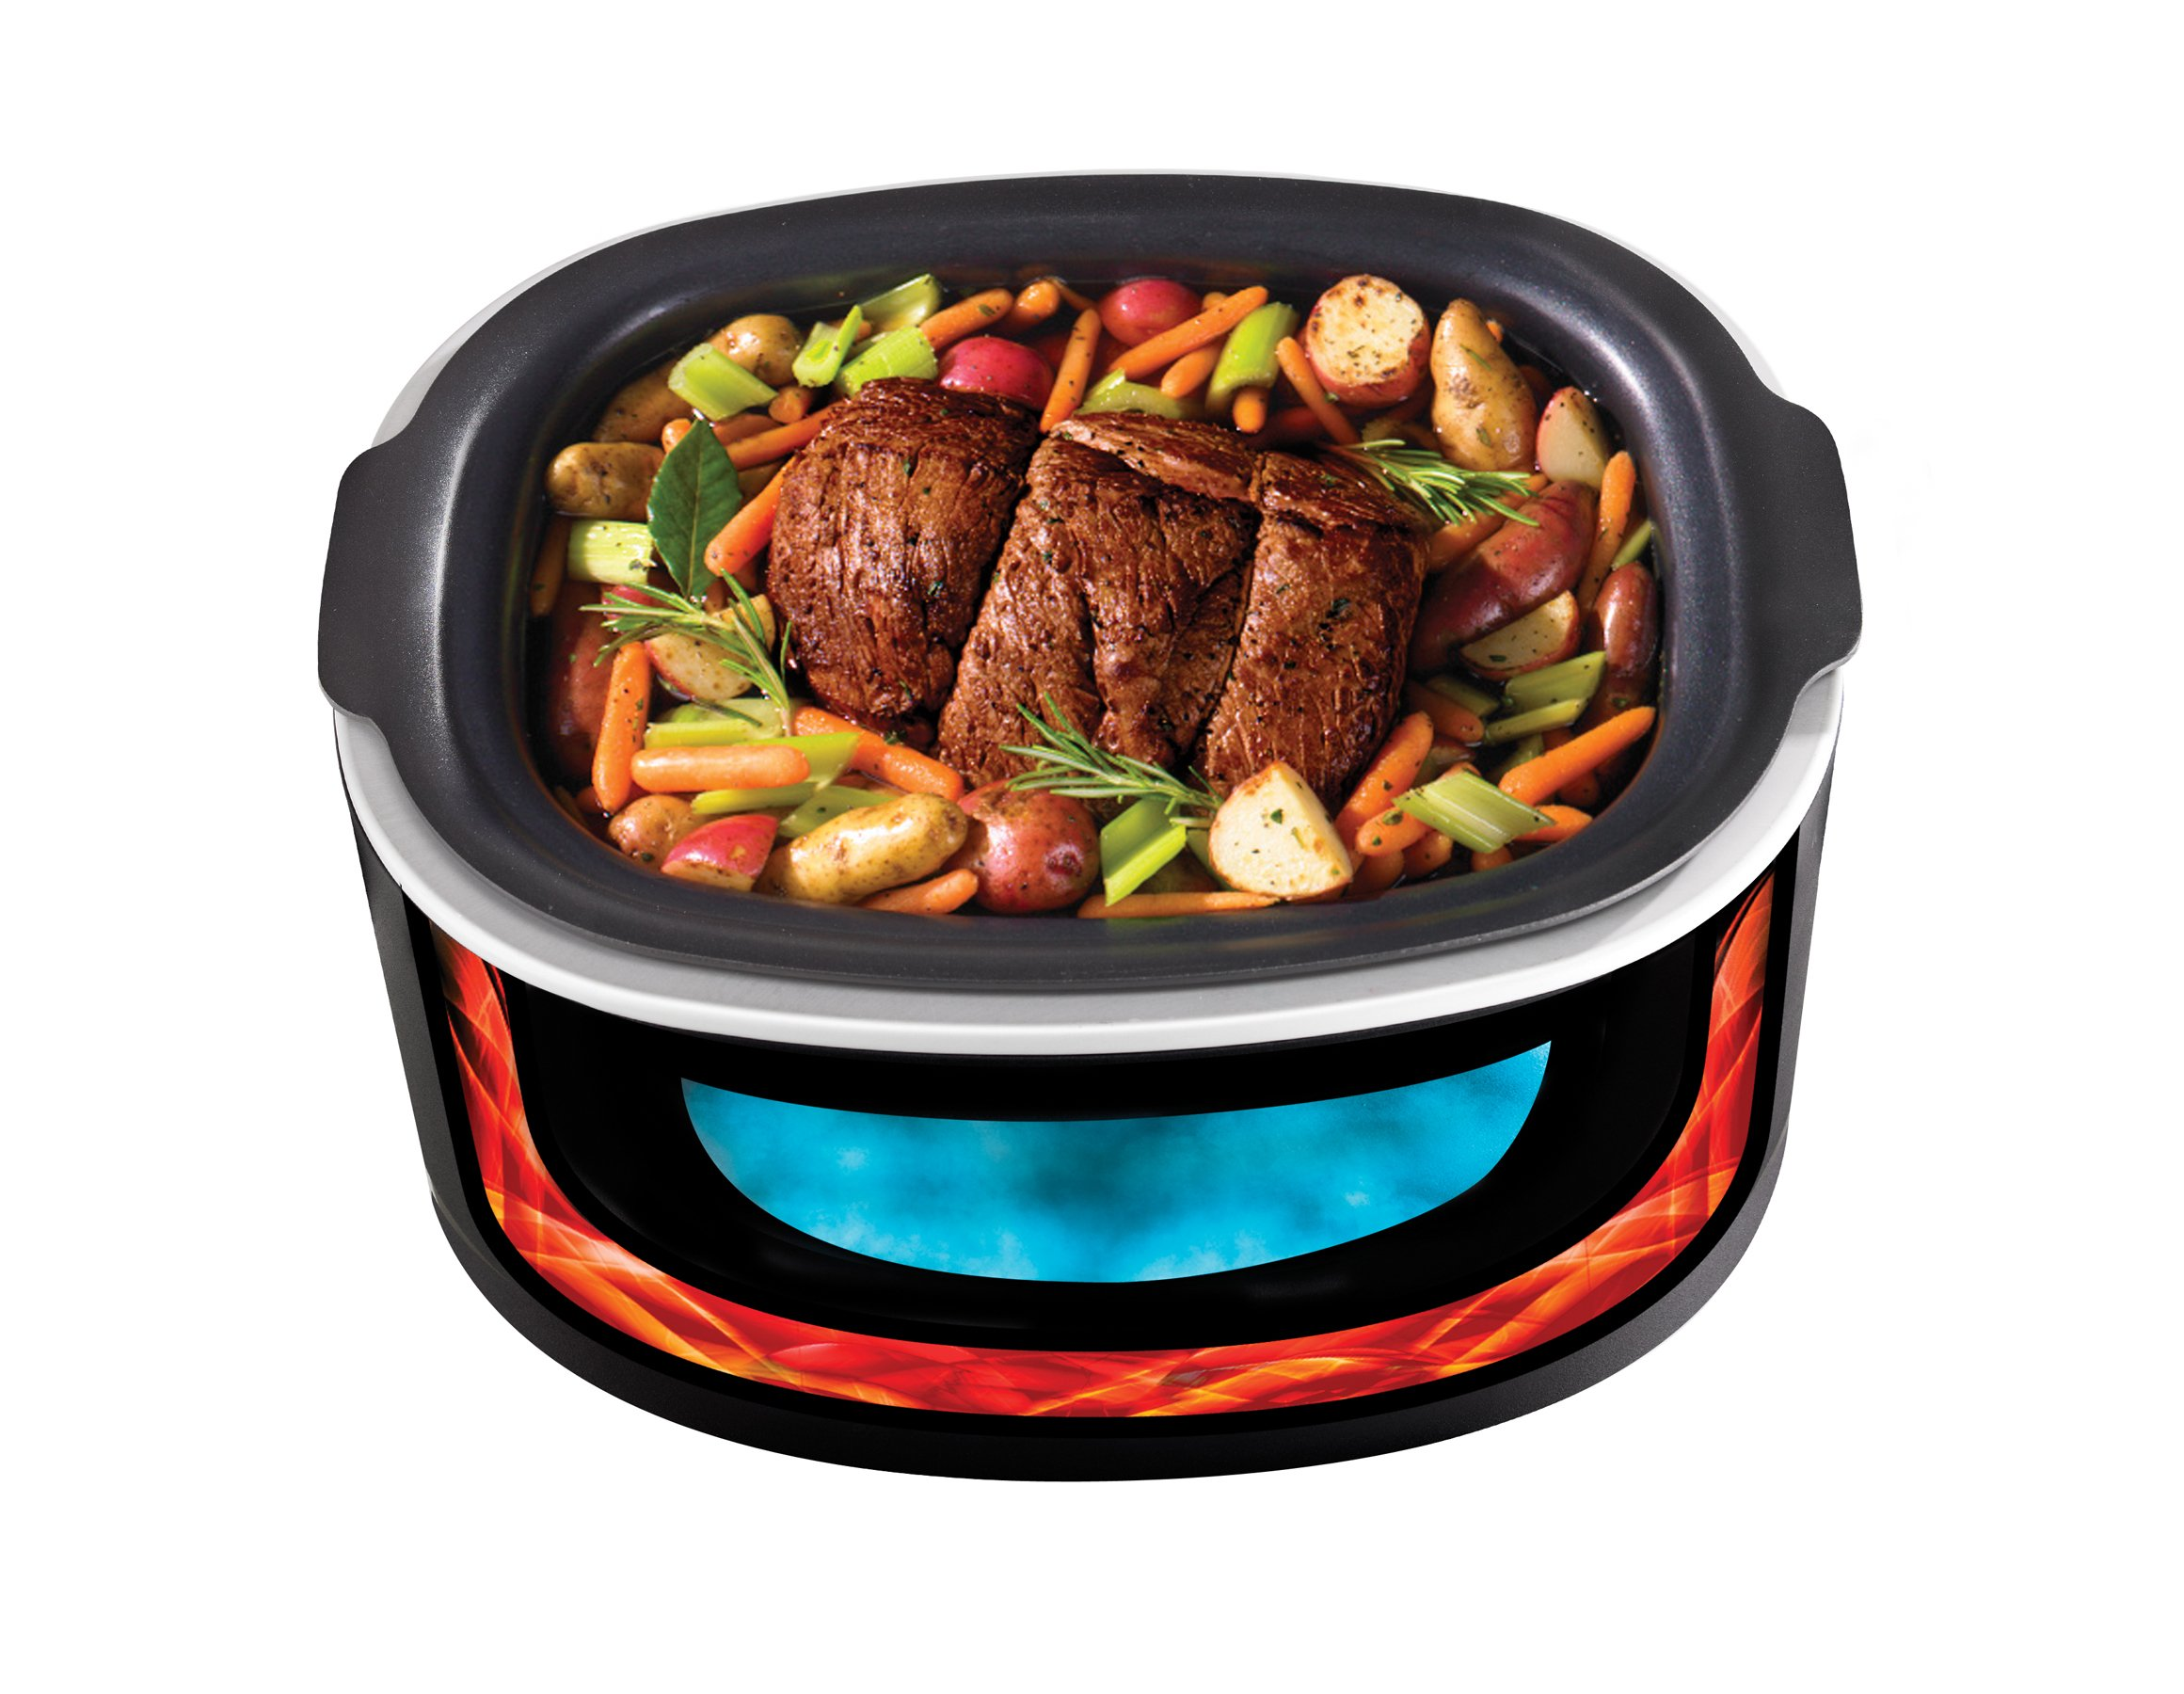 Ninja 3-in-1 Cooking System (MC750)